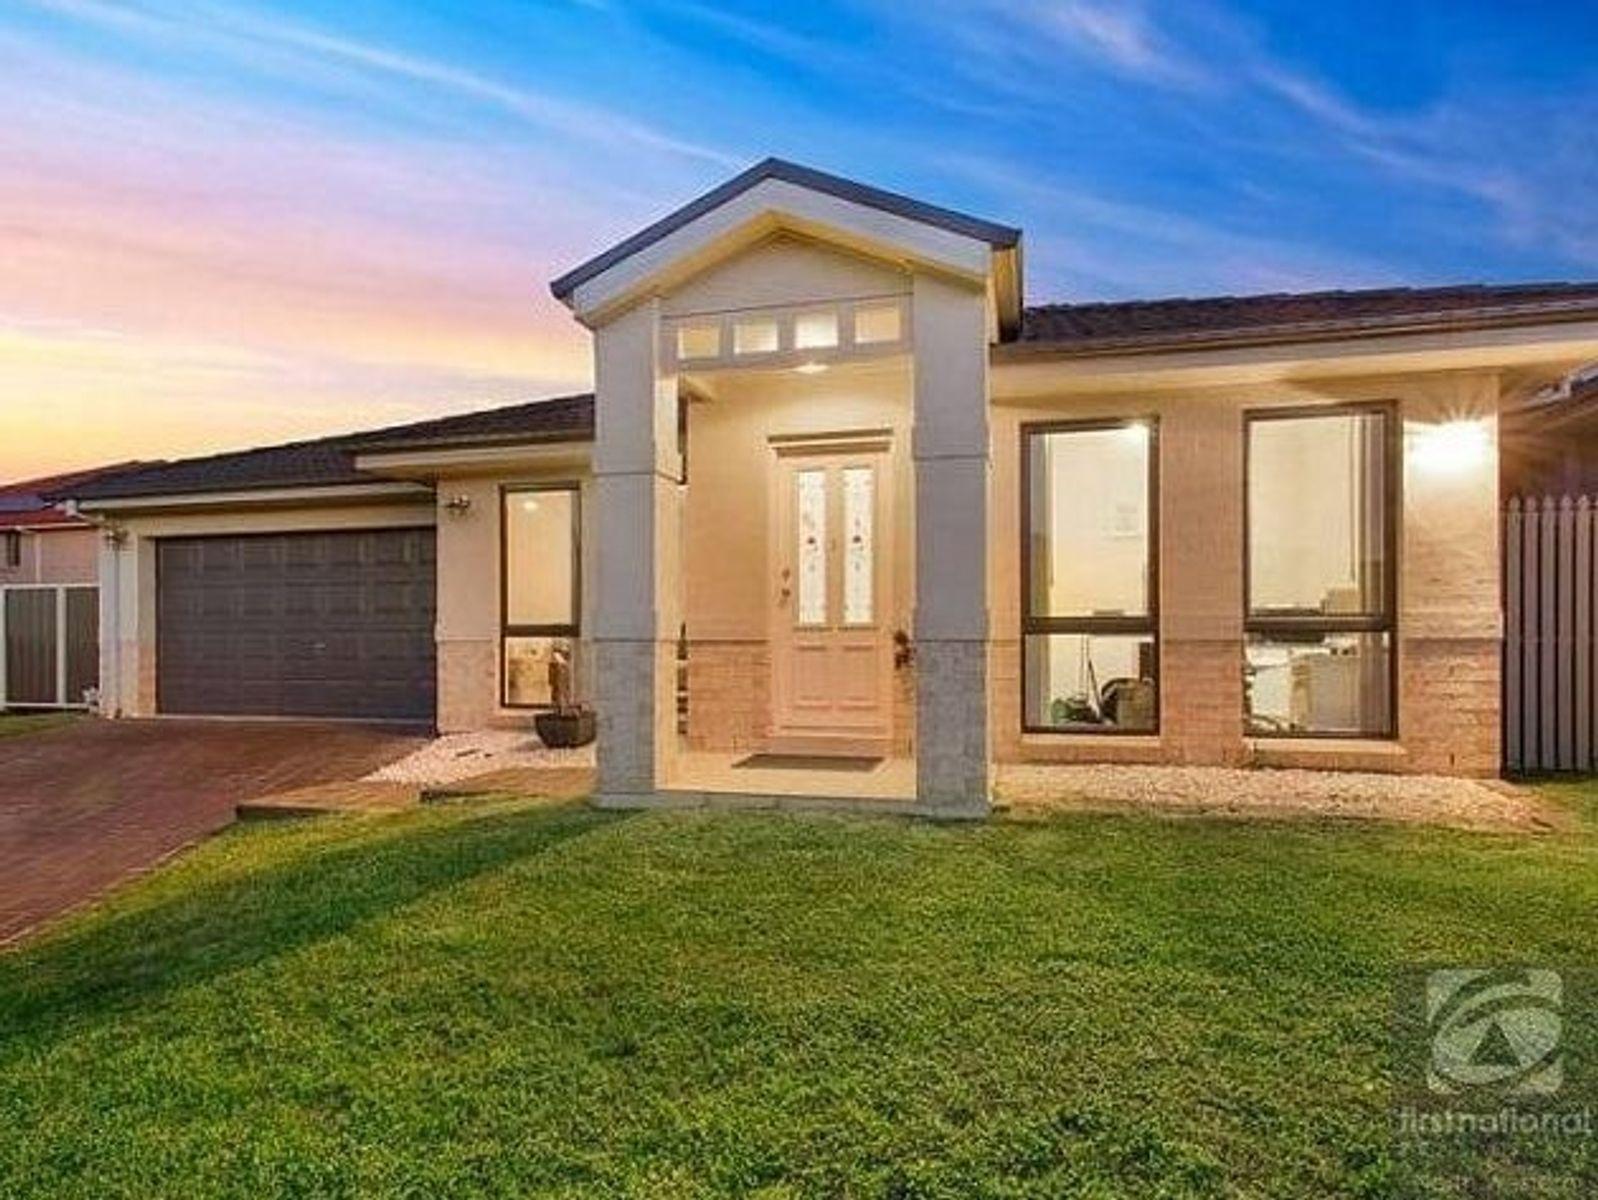 12 Woodward Avenue, Stanhope Gardens, NSW 2768